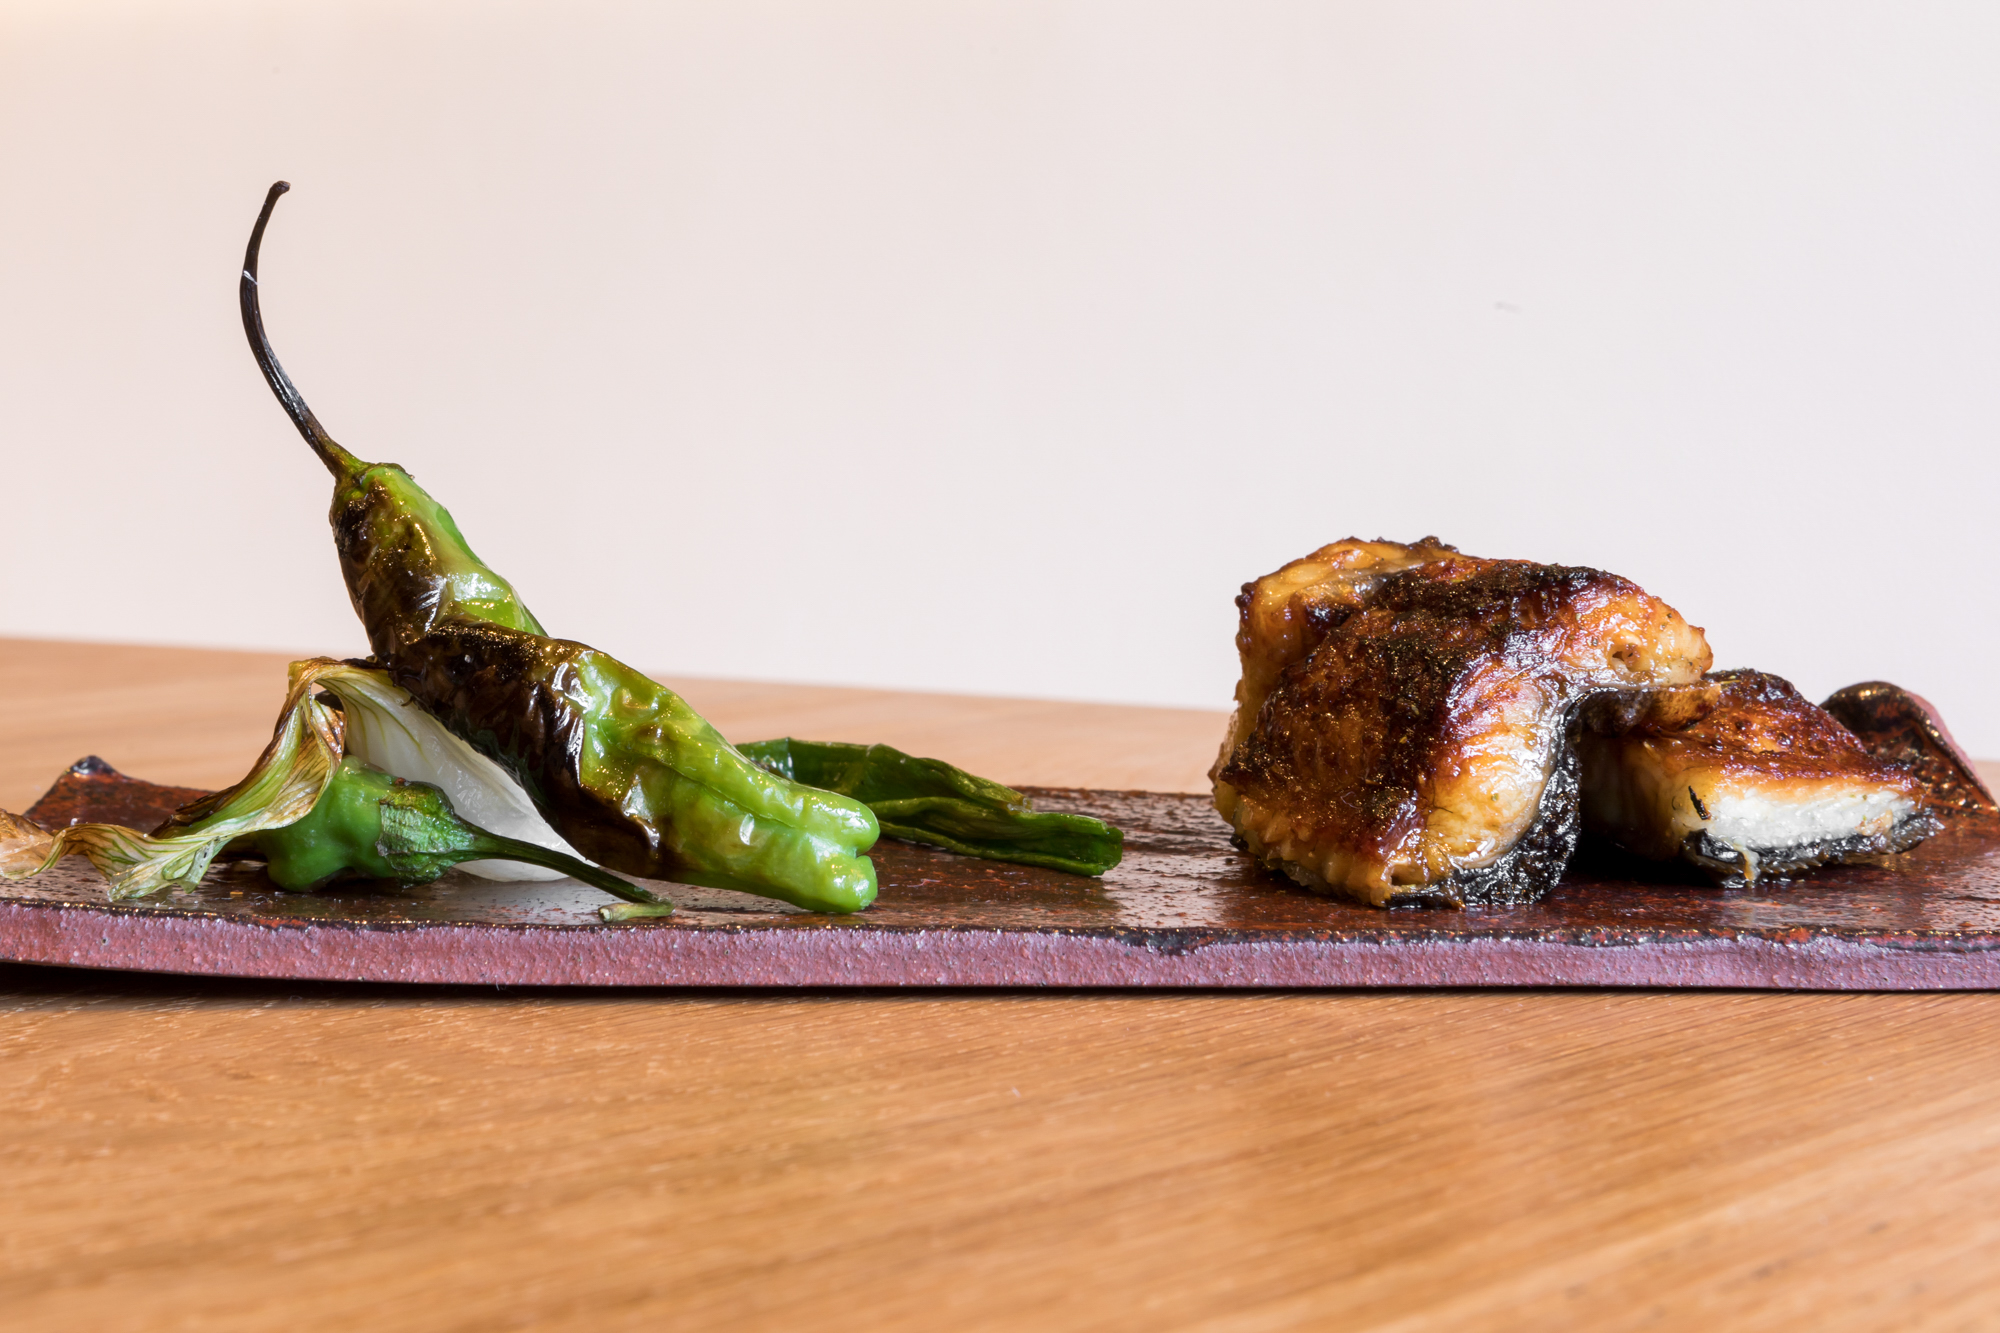 Grilled unagi and shishito peppers